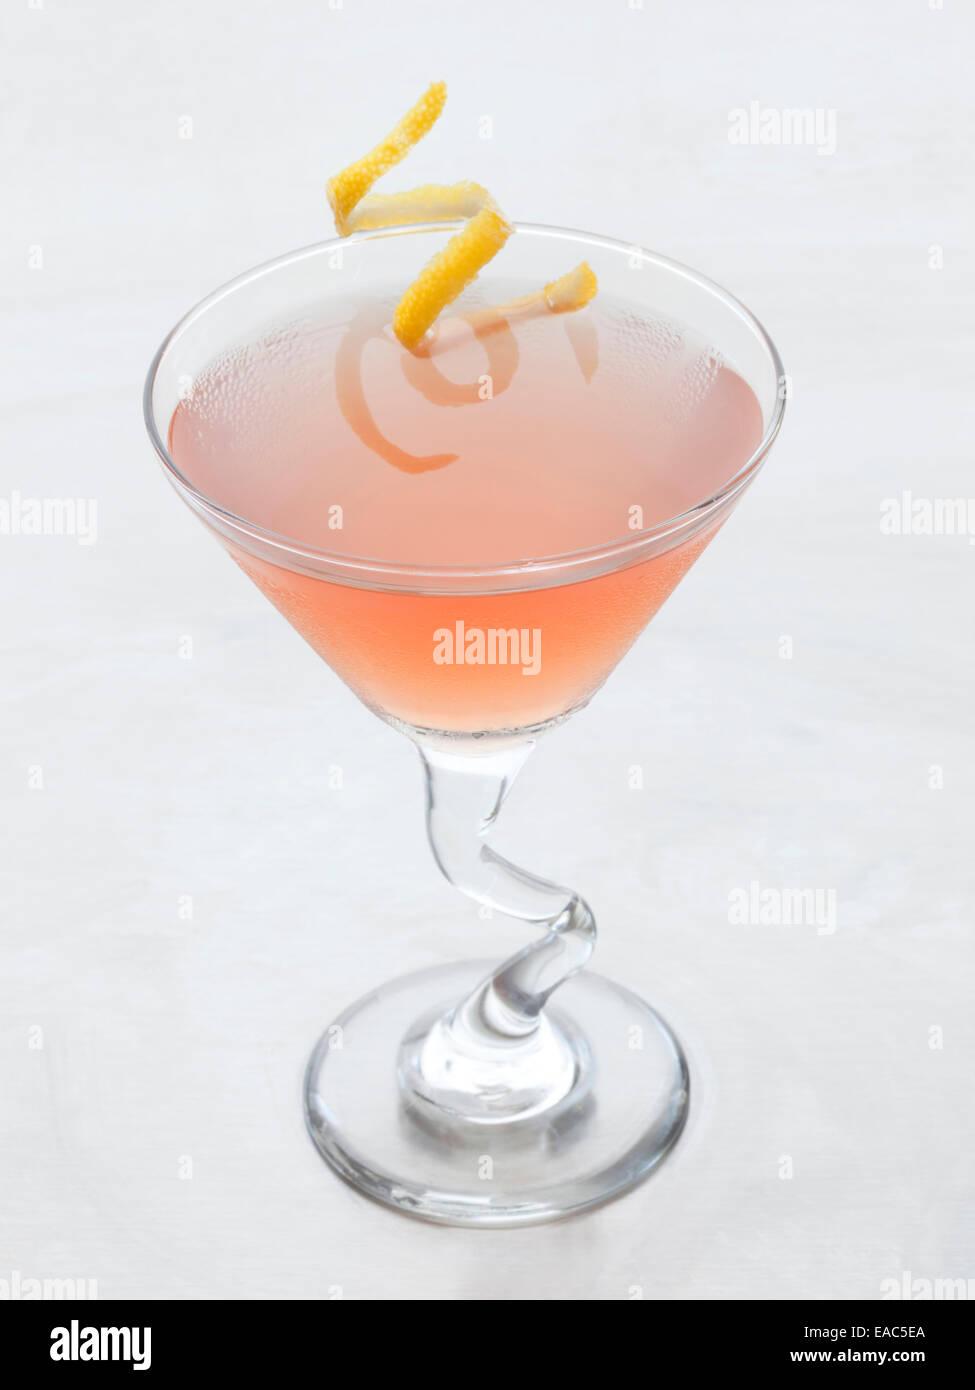 Cosmopolitan with lemon rind garnish - Stock Image